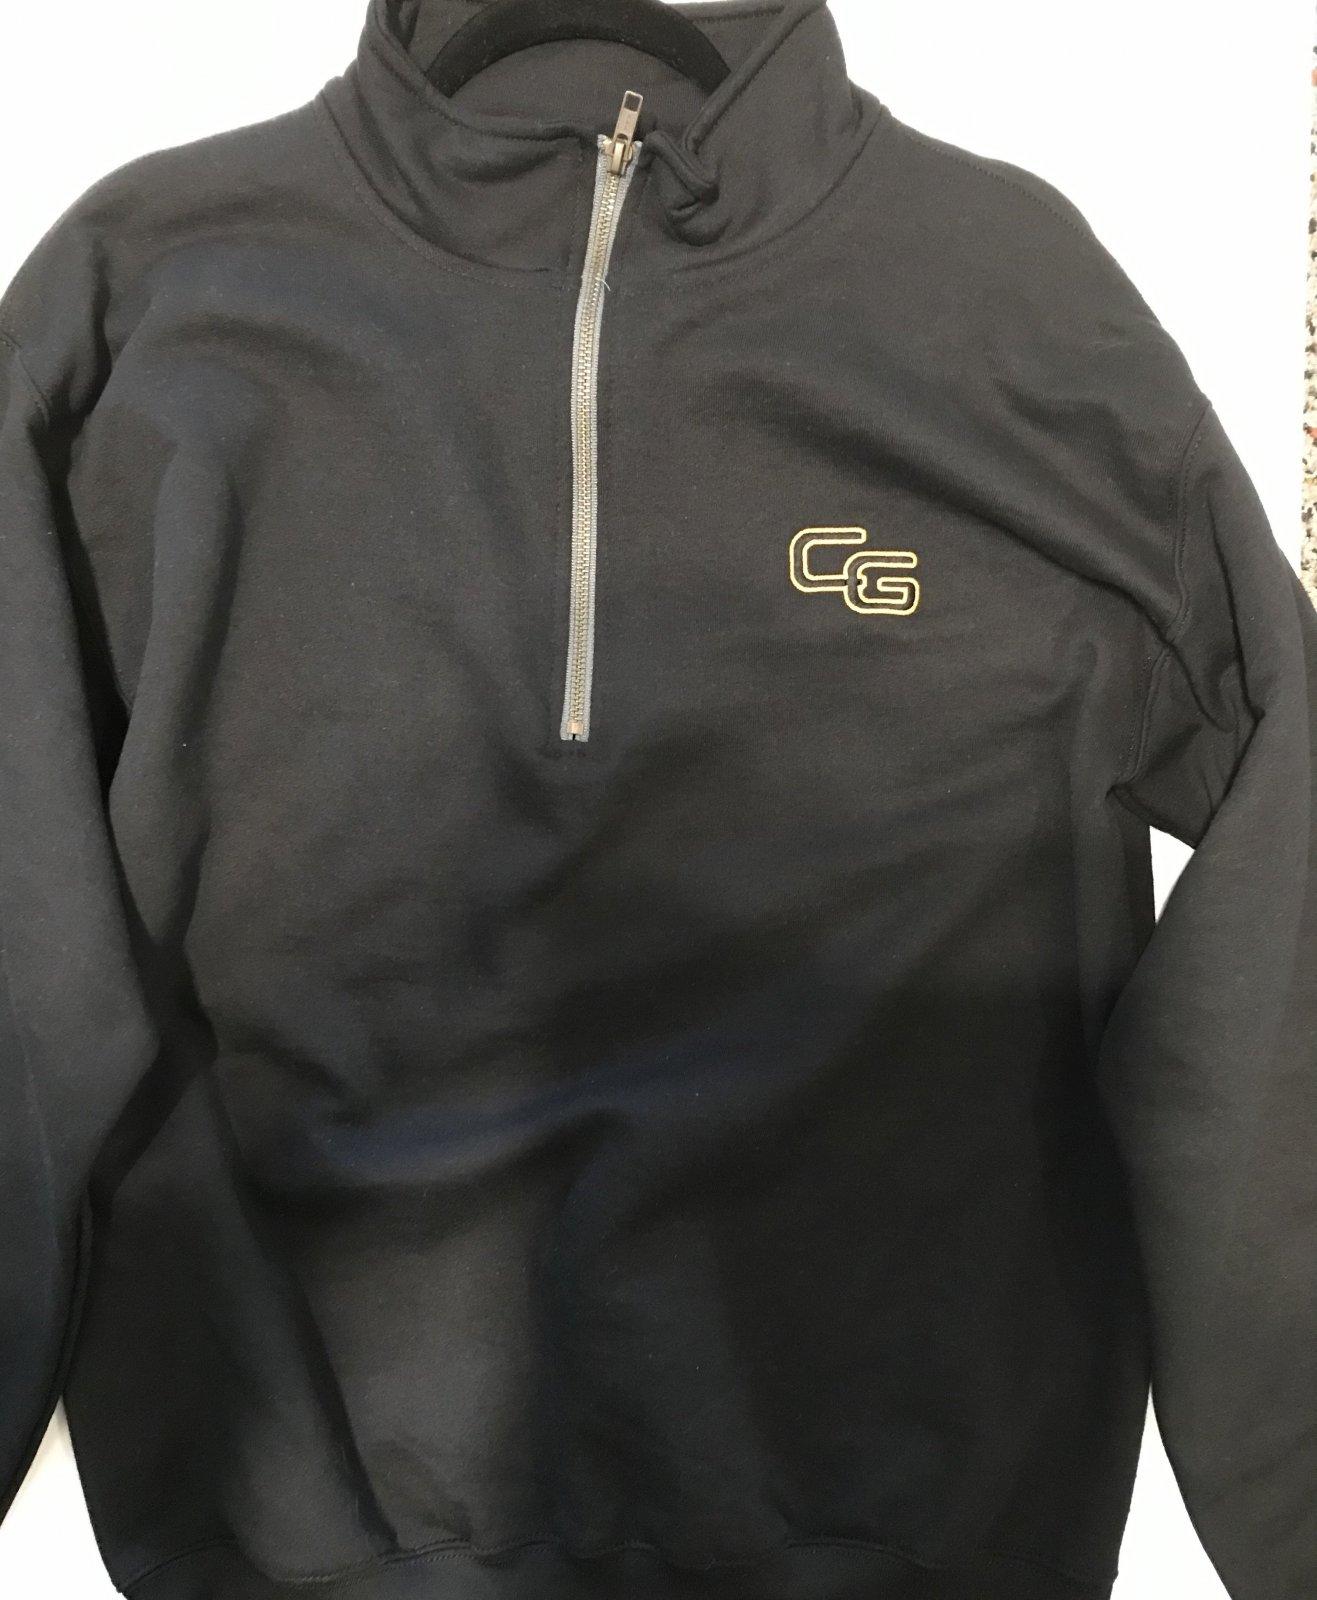 Gildan CG 1/4 Zip Pullover